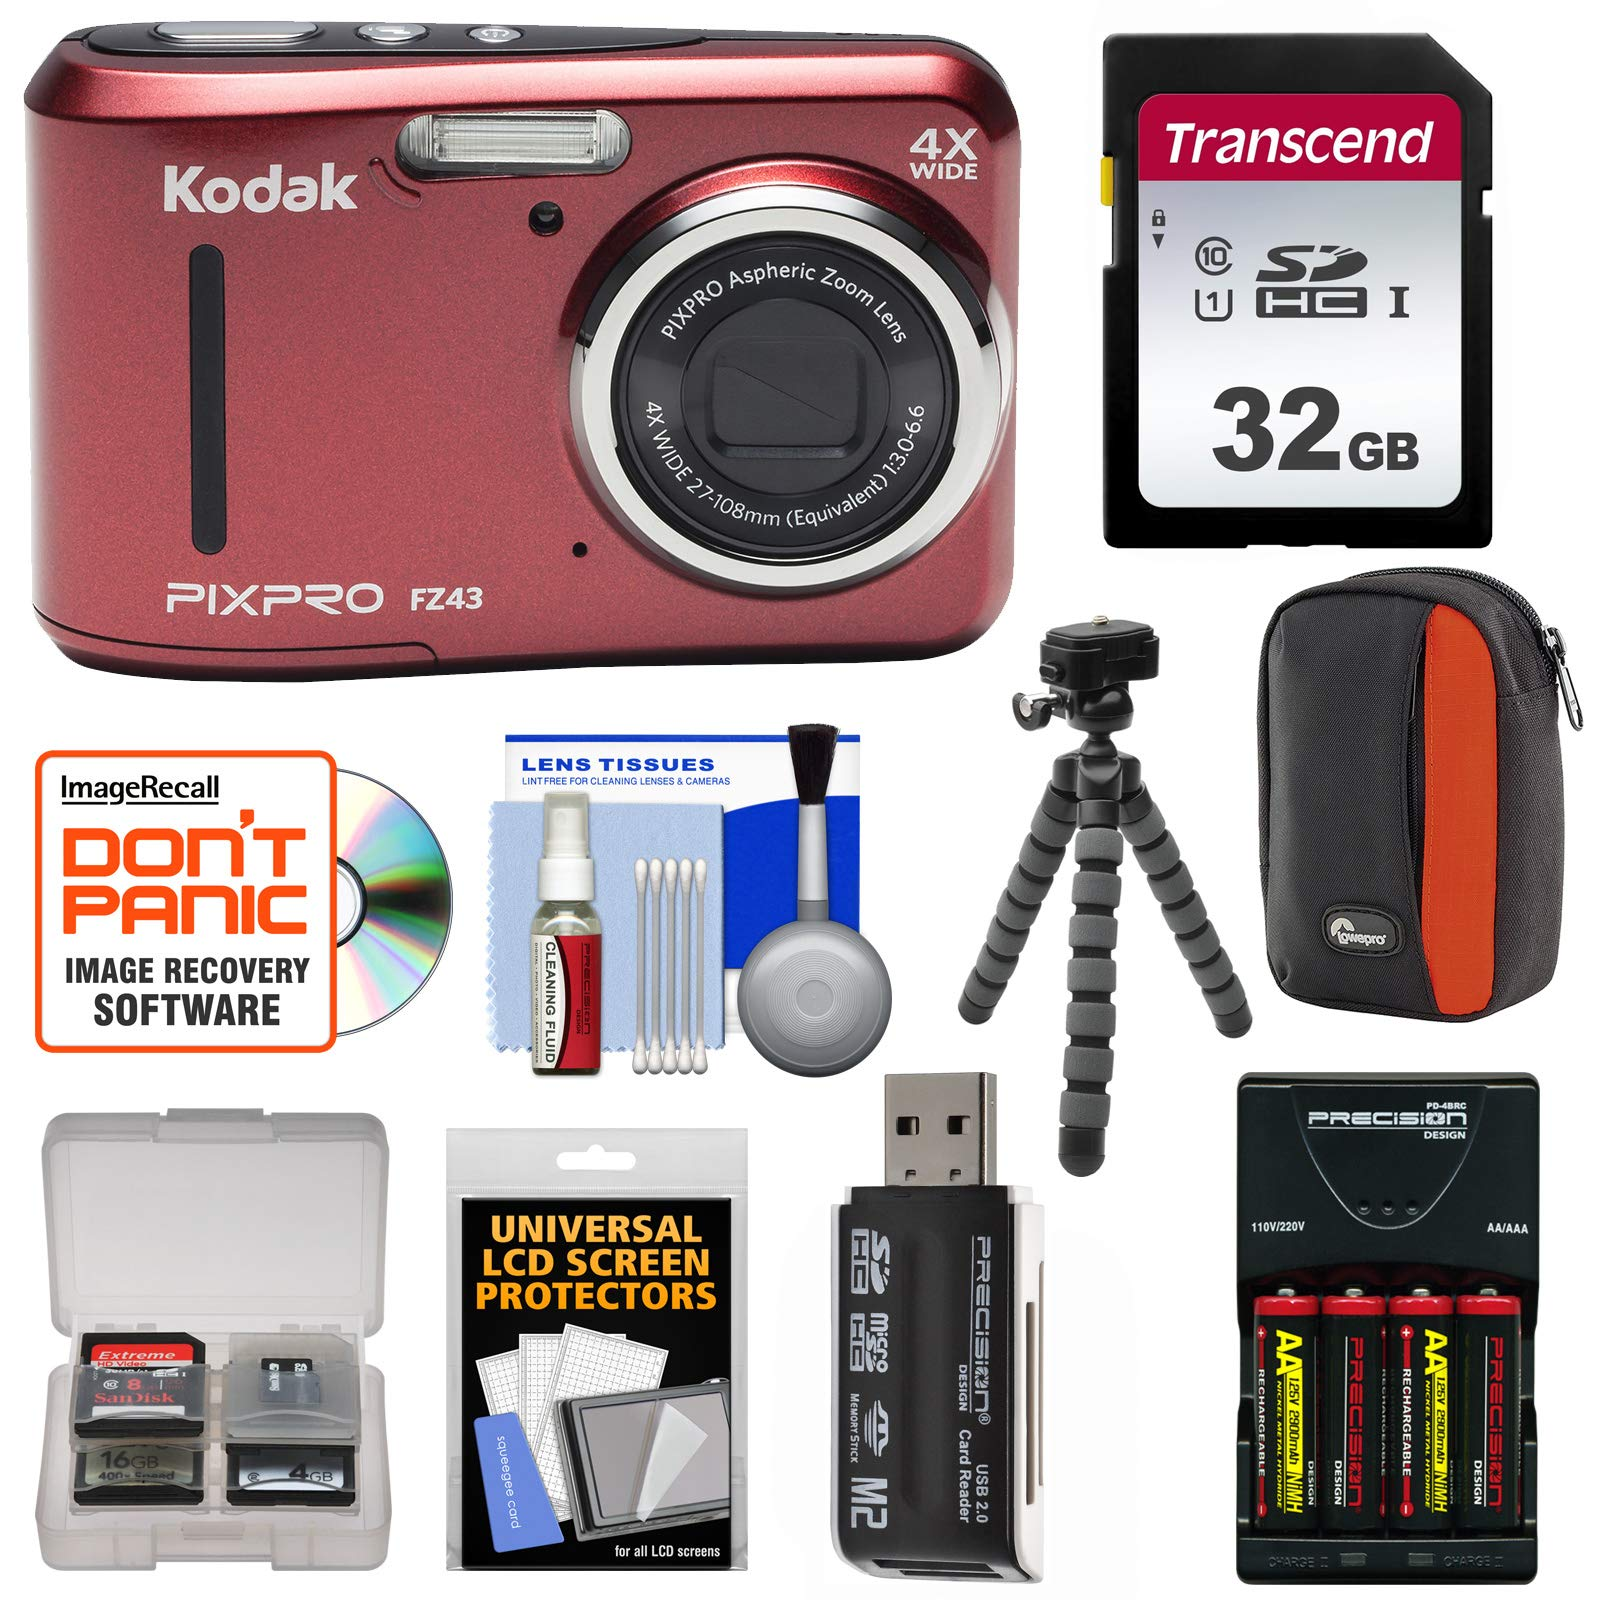 KODAK PIXPRO Friendly Zoom FZ43 Digital Camera (Red) with 32GB Card + Batteries & Charger + Case + Flex Tripod + Kit